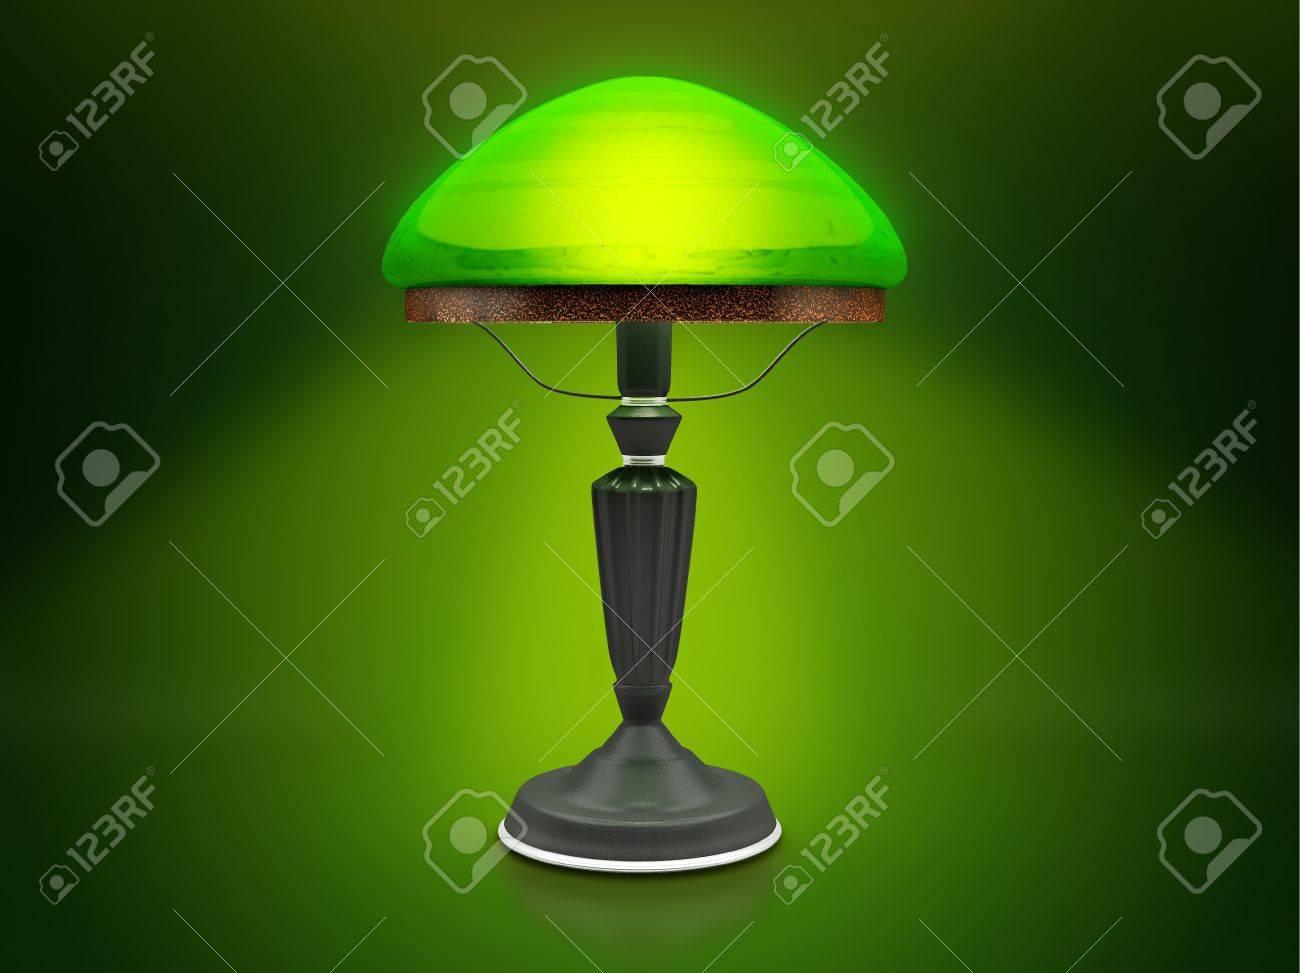 Vintage Lamp Green Desk Lamp Glow In The Dark Green Antique – Green Desk Lamp